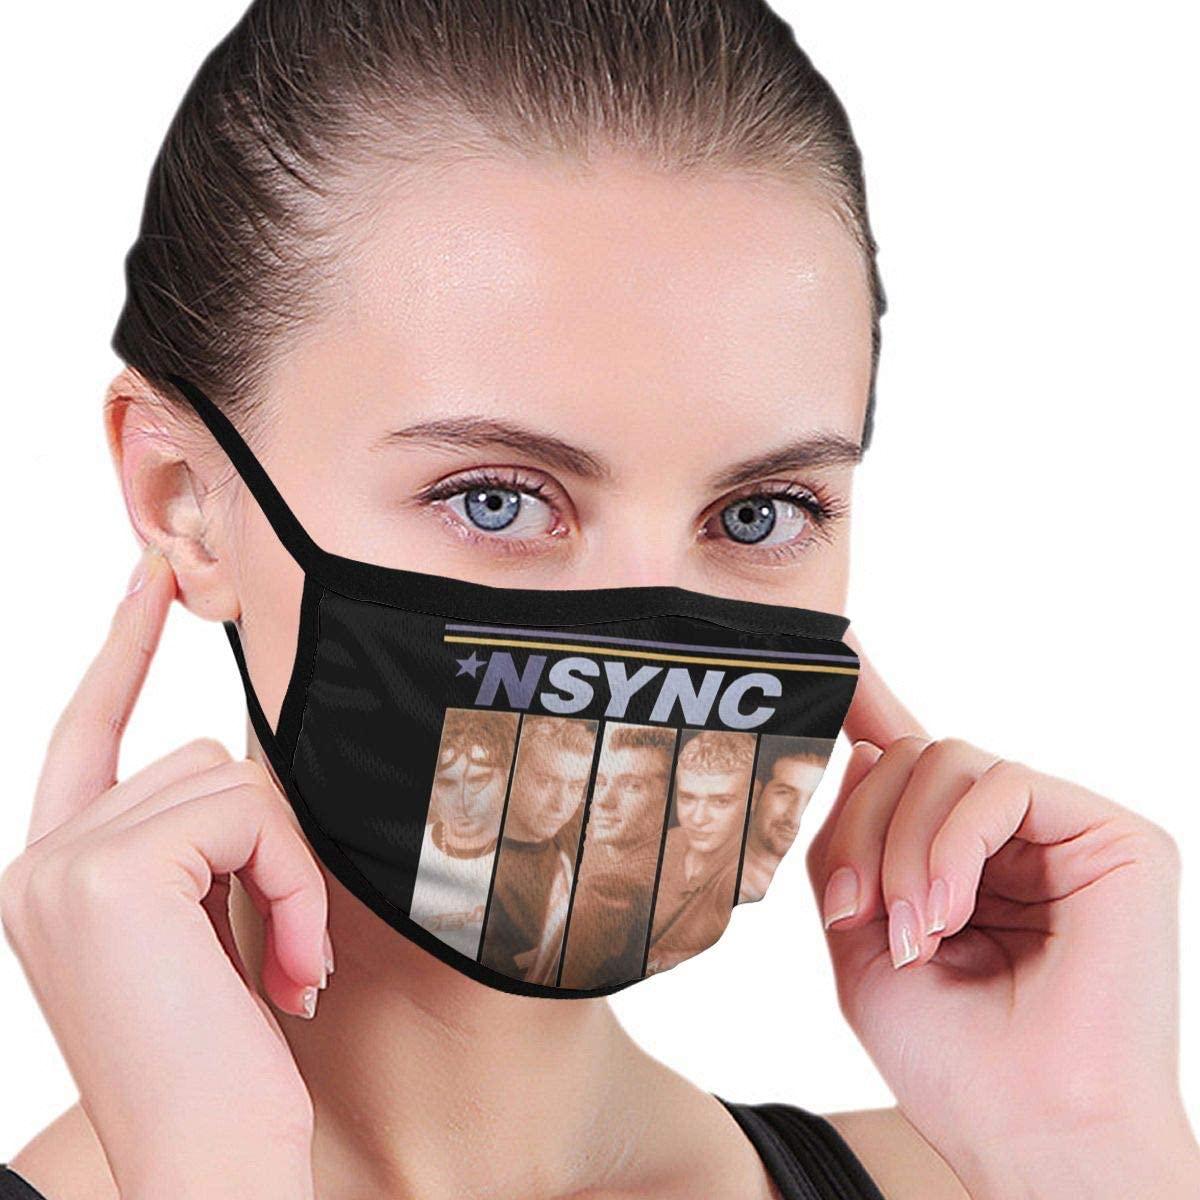 Qwtykeertyi NSYNC Fashion Protective Reusable Unisex Black Cotton Washable Balaclava